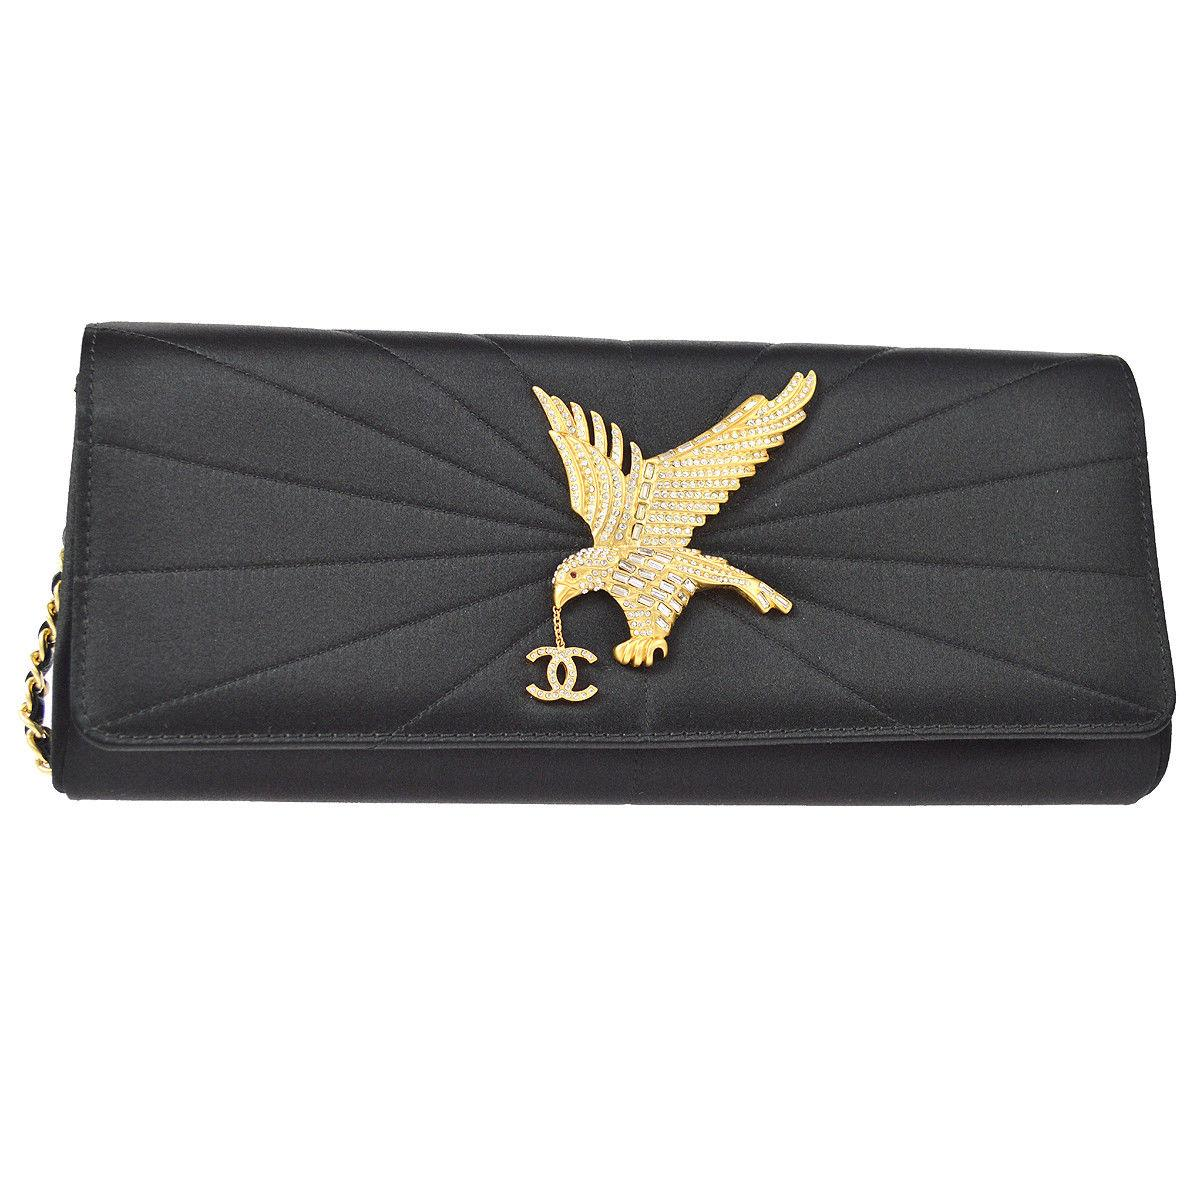 Chanel Black Satin Gold Rhinestone Bird Charm Evening Clutch Flap Bag in Box